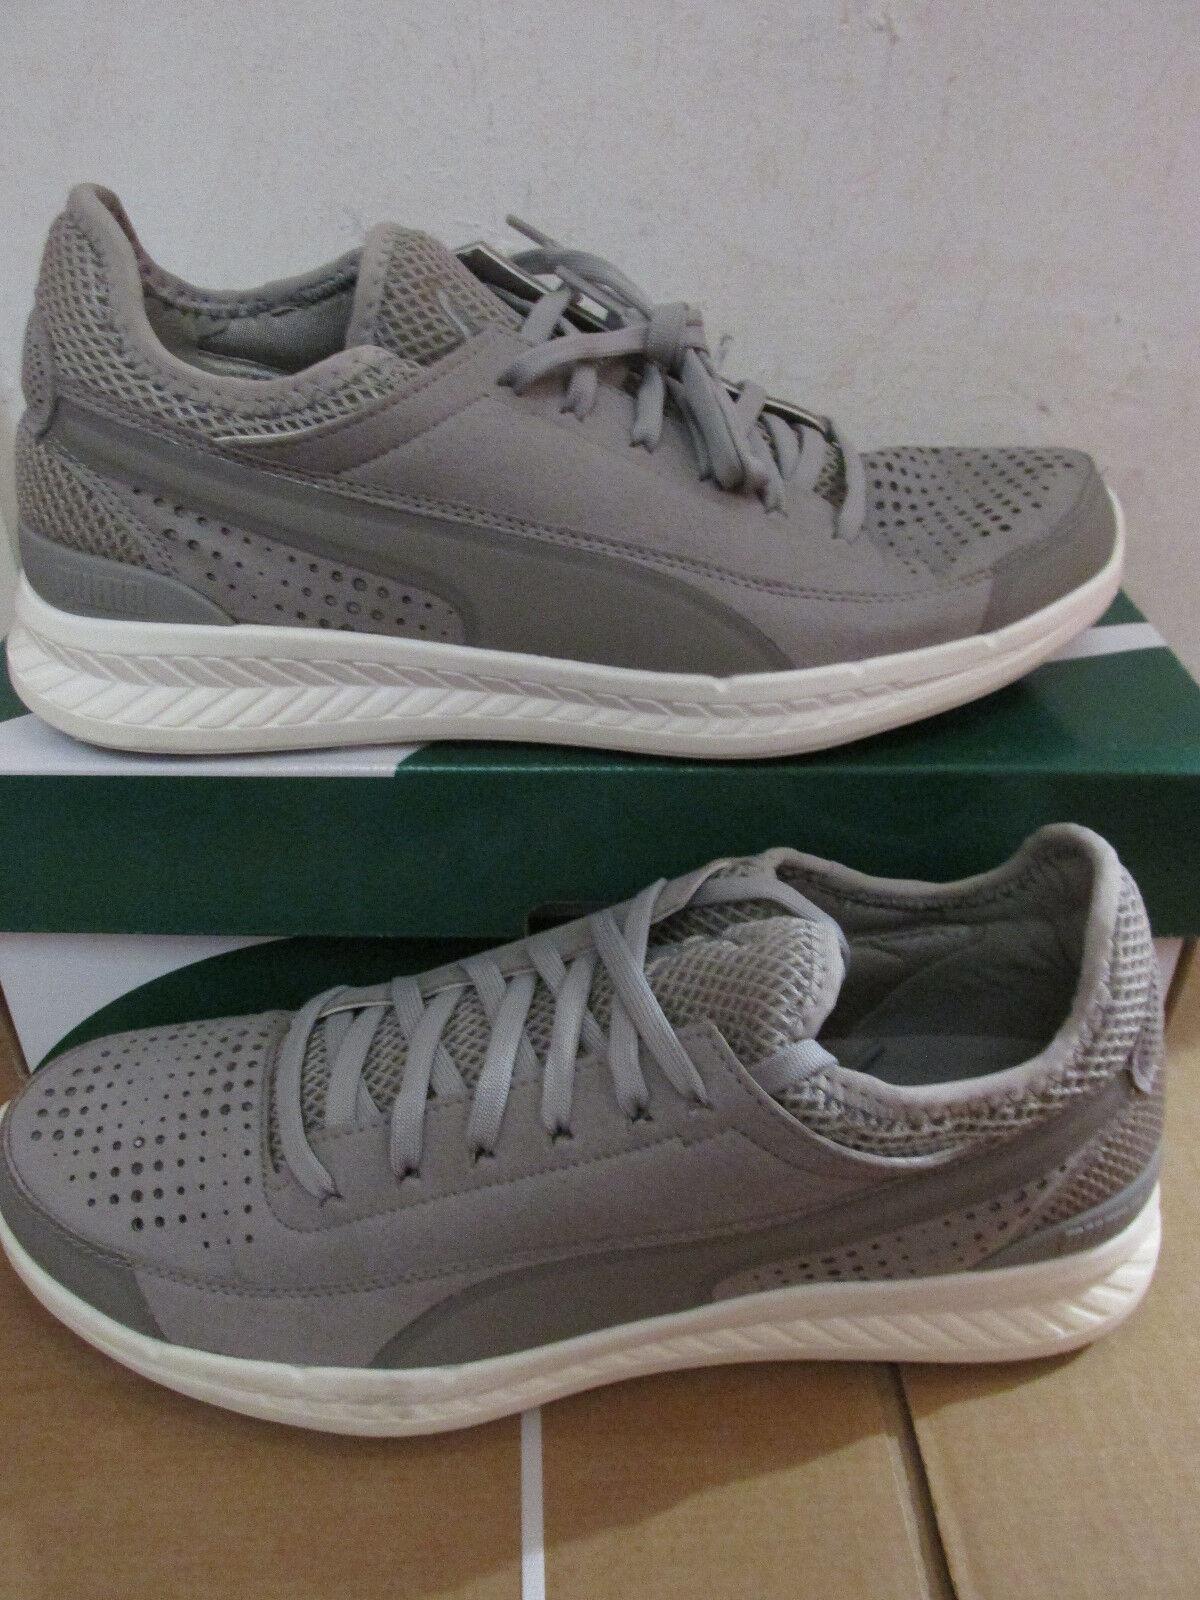 Puma Entzünden Socke Herren Laufschuhe 360570 02 Turnschuhe Schuhe Ausverkauf